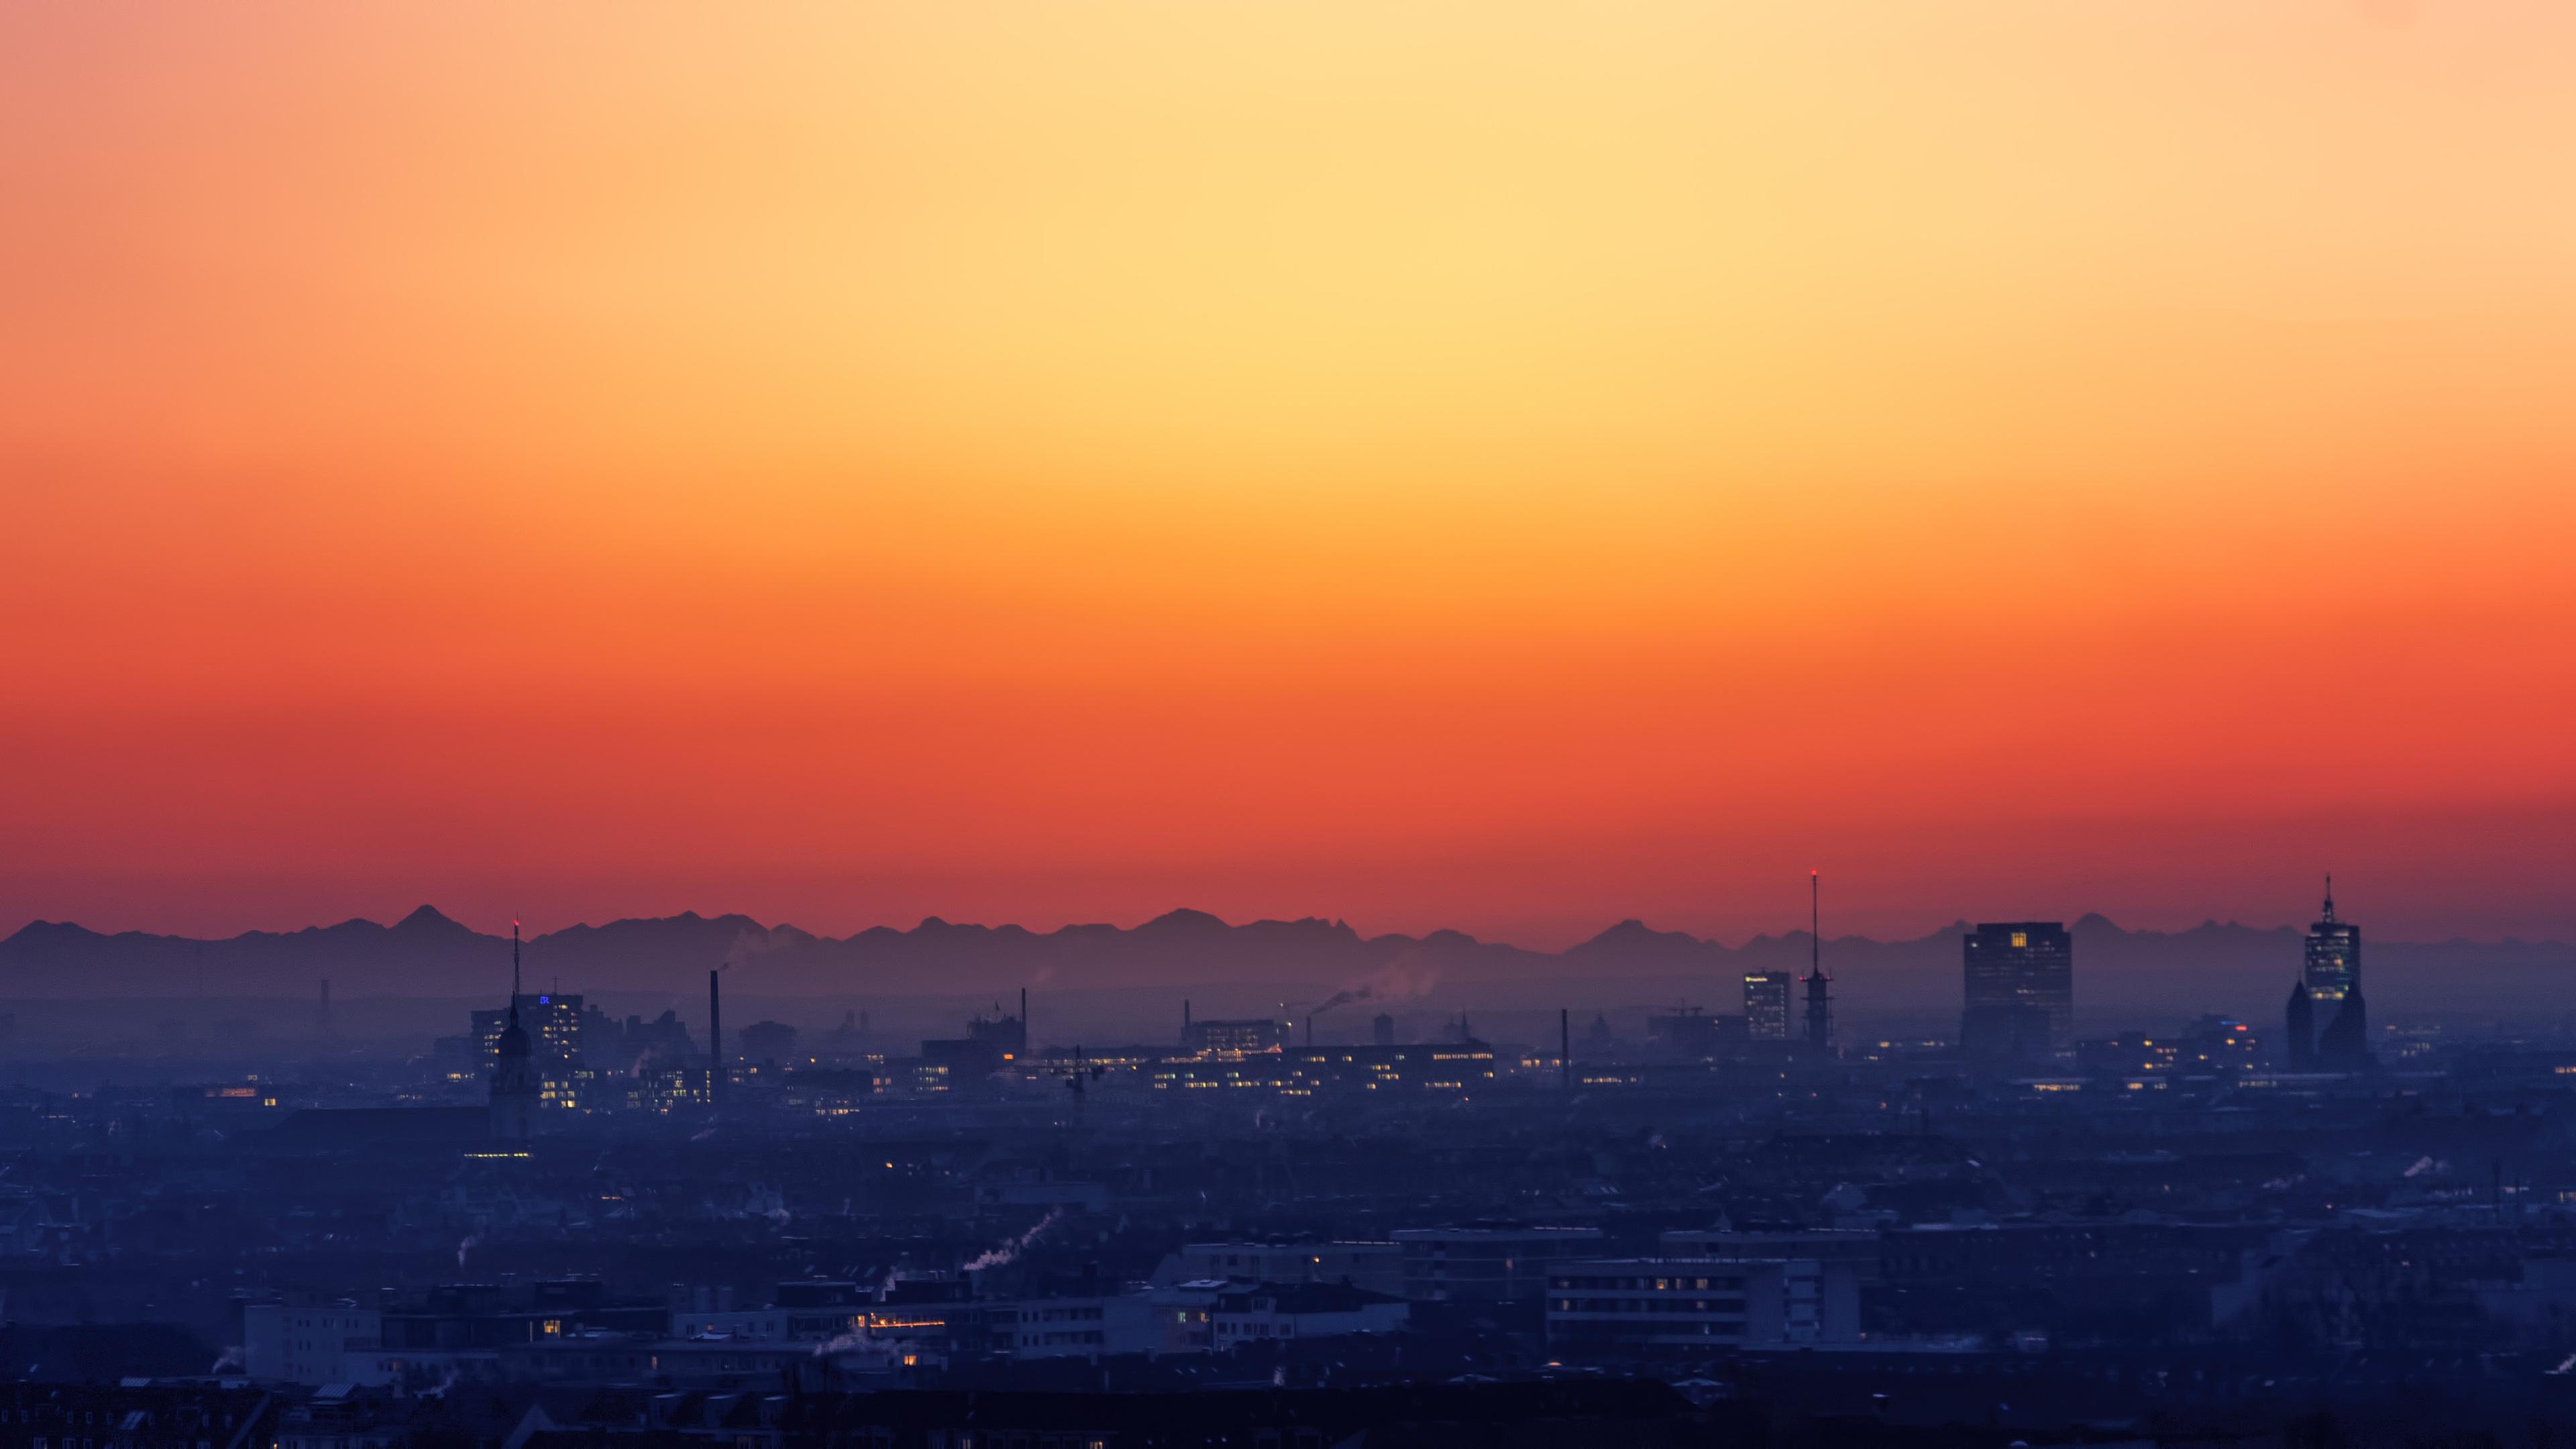 sunset-3095689.jpg